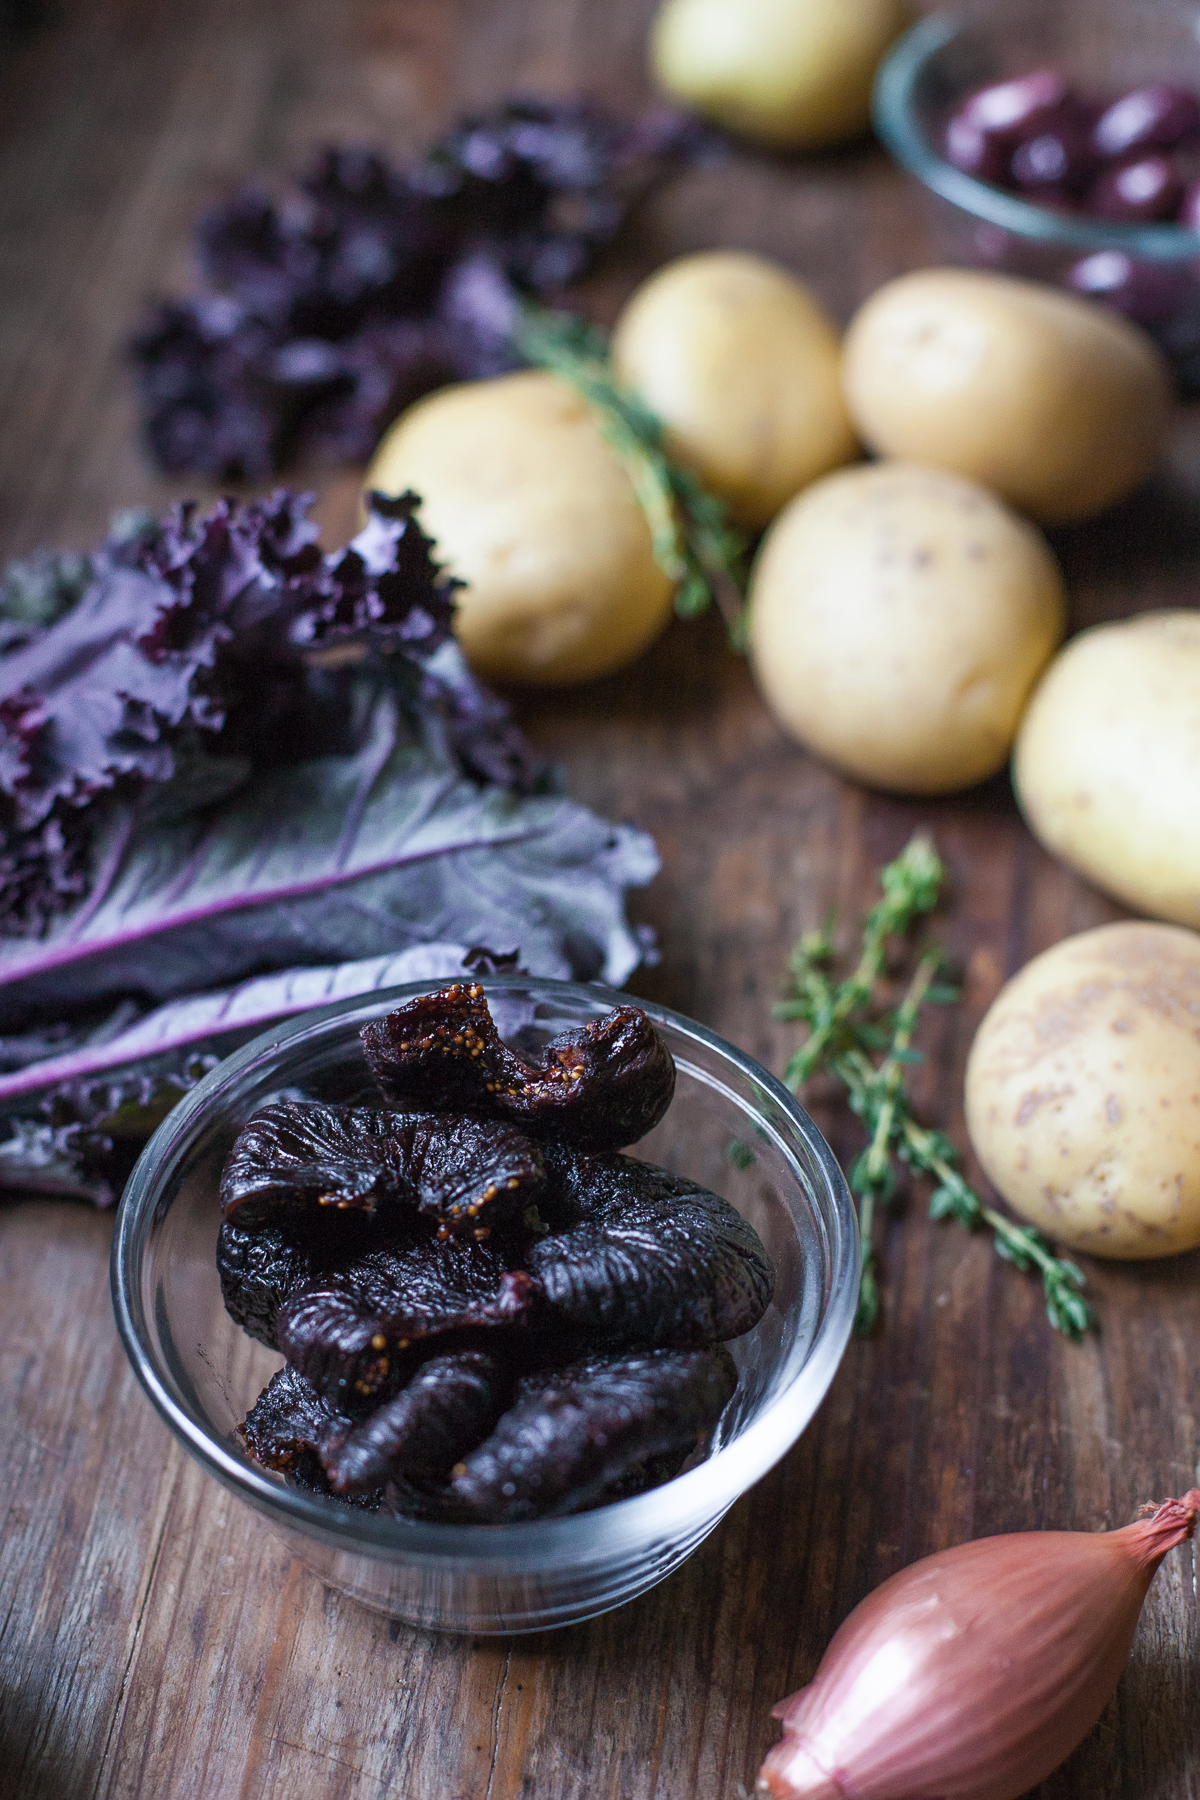 Pollo asado a la sartén con higos y aceitunas de The New Yiddish Kitchen